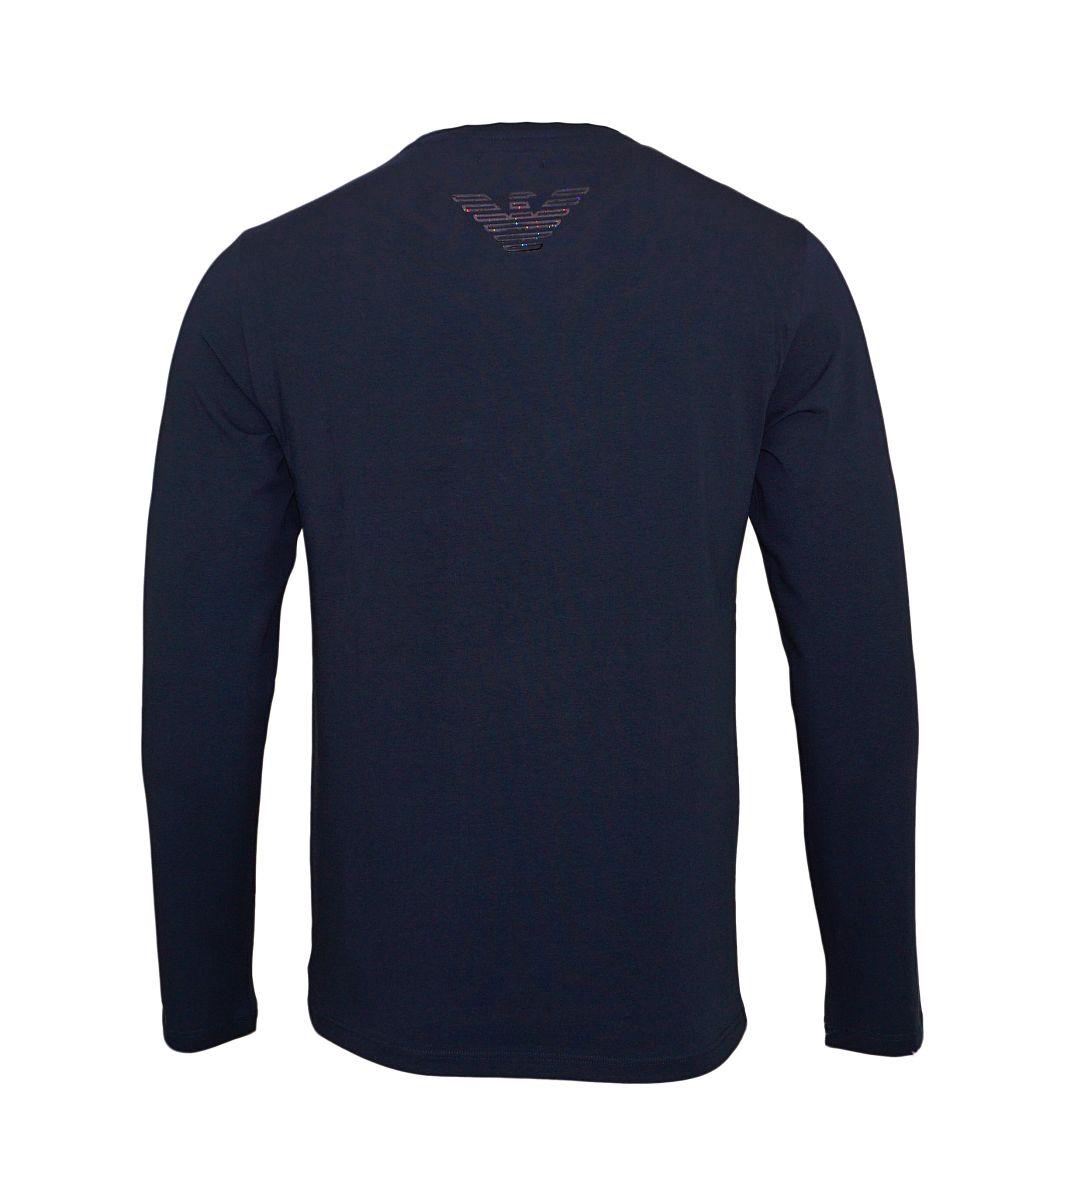 Emporio Armani Longsleeve Sweater Rundhals 111653 7A595 00135 MARINE HW17-AS1